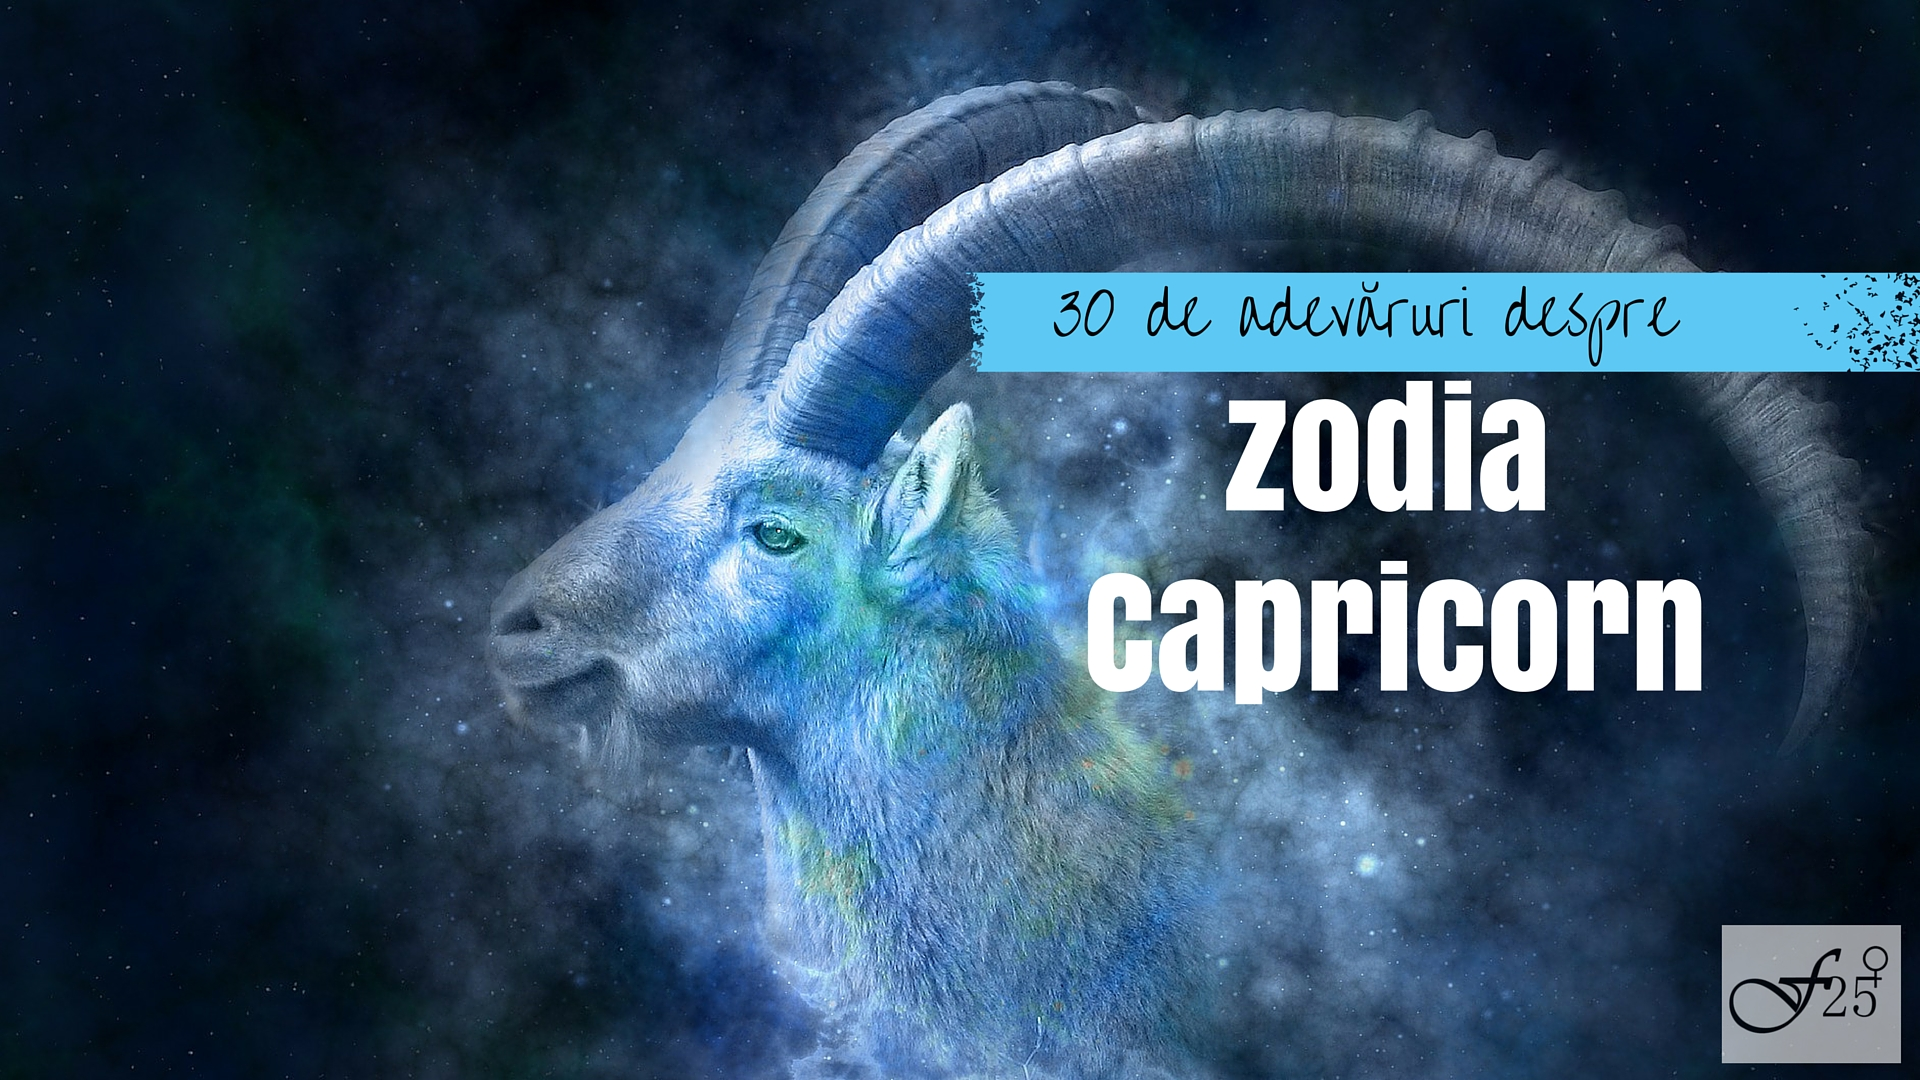 Si rac capricorn femeia forum barbatul Compatibilitati Rac